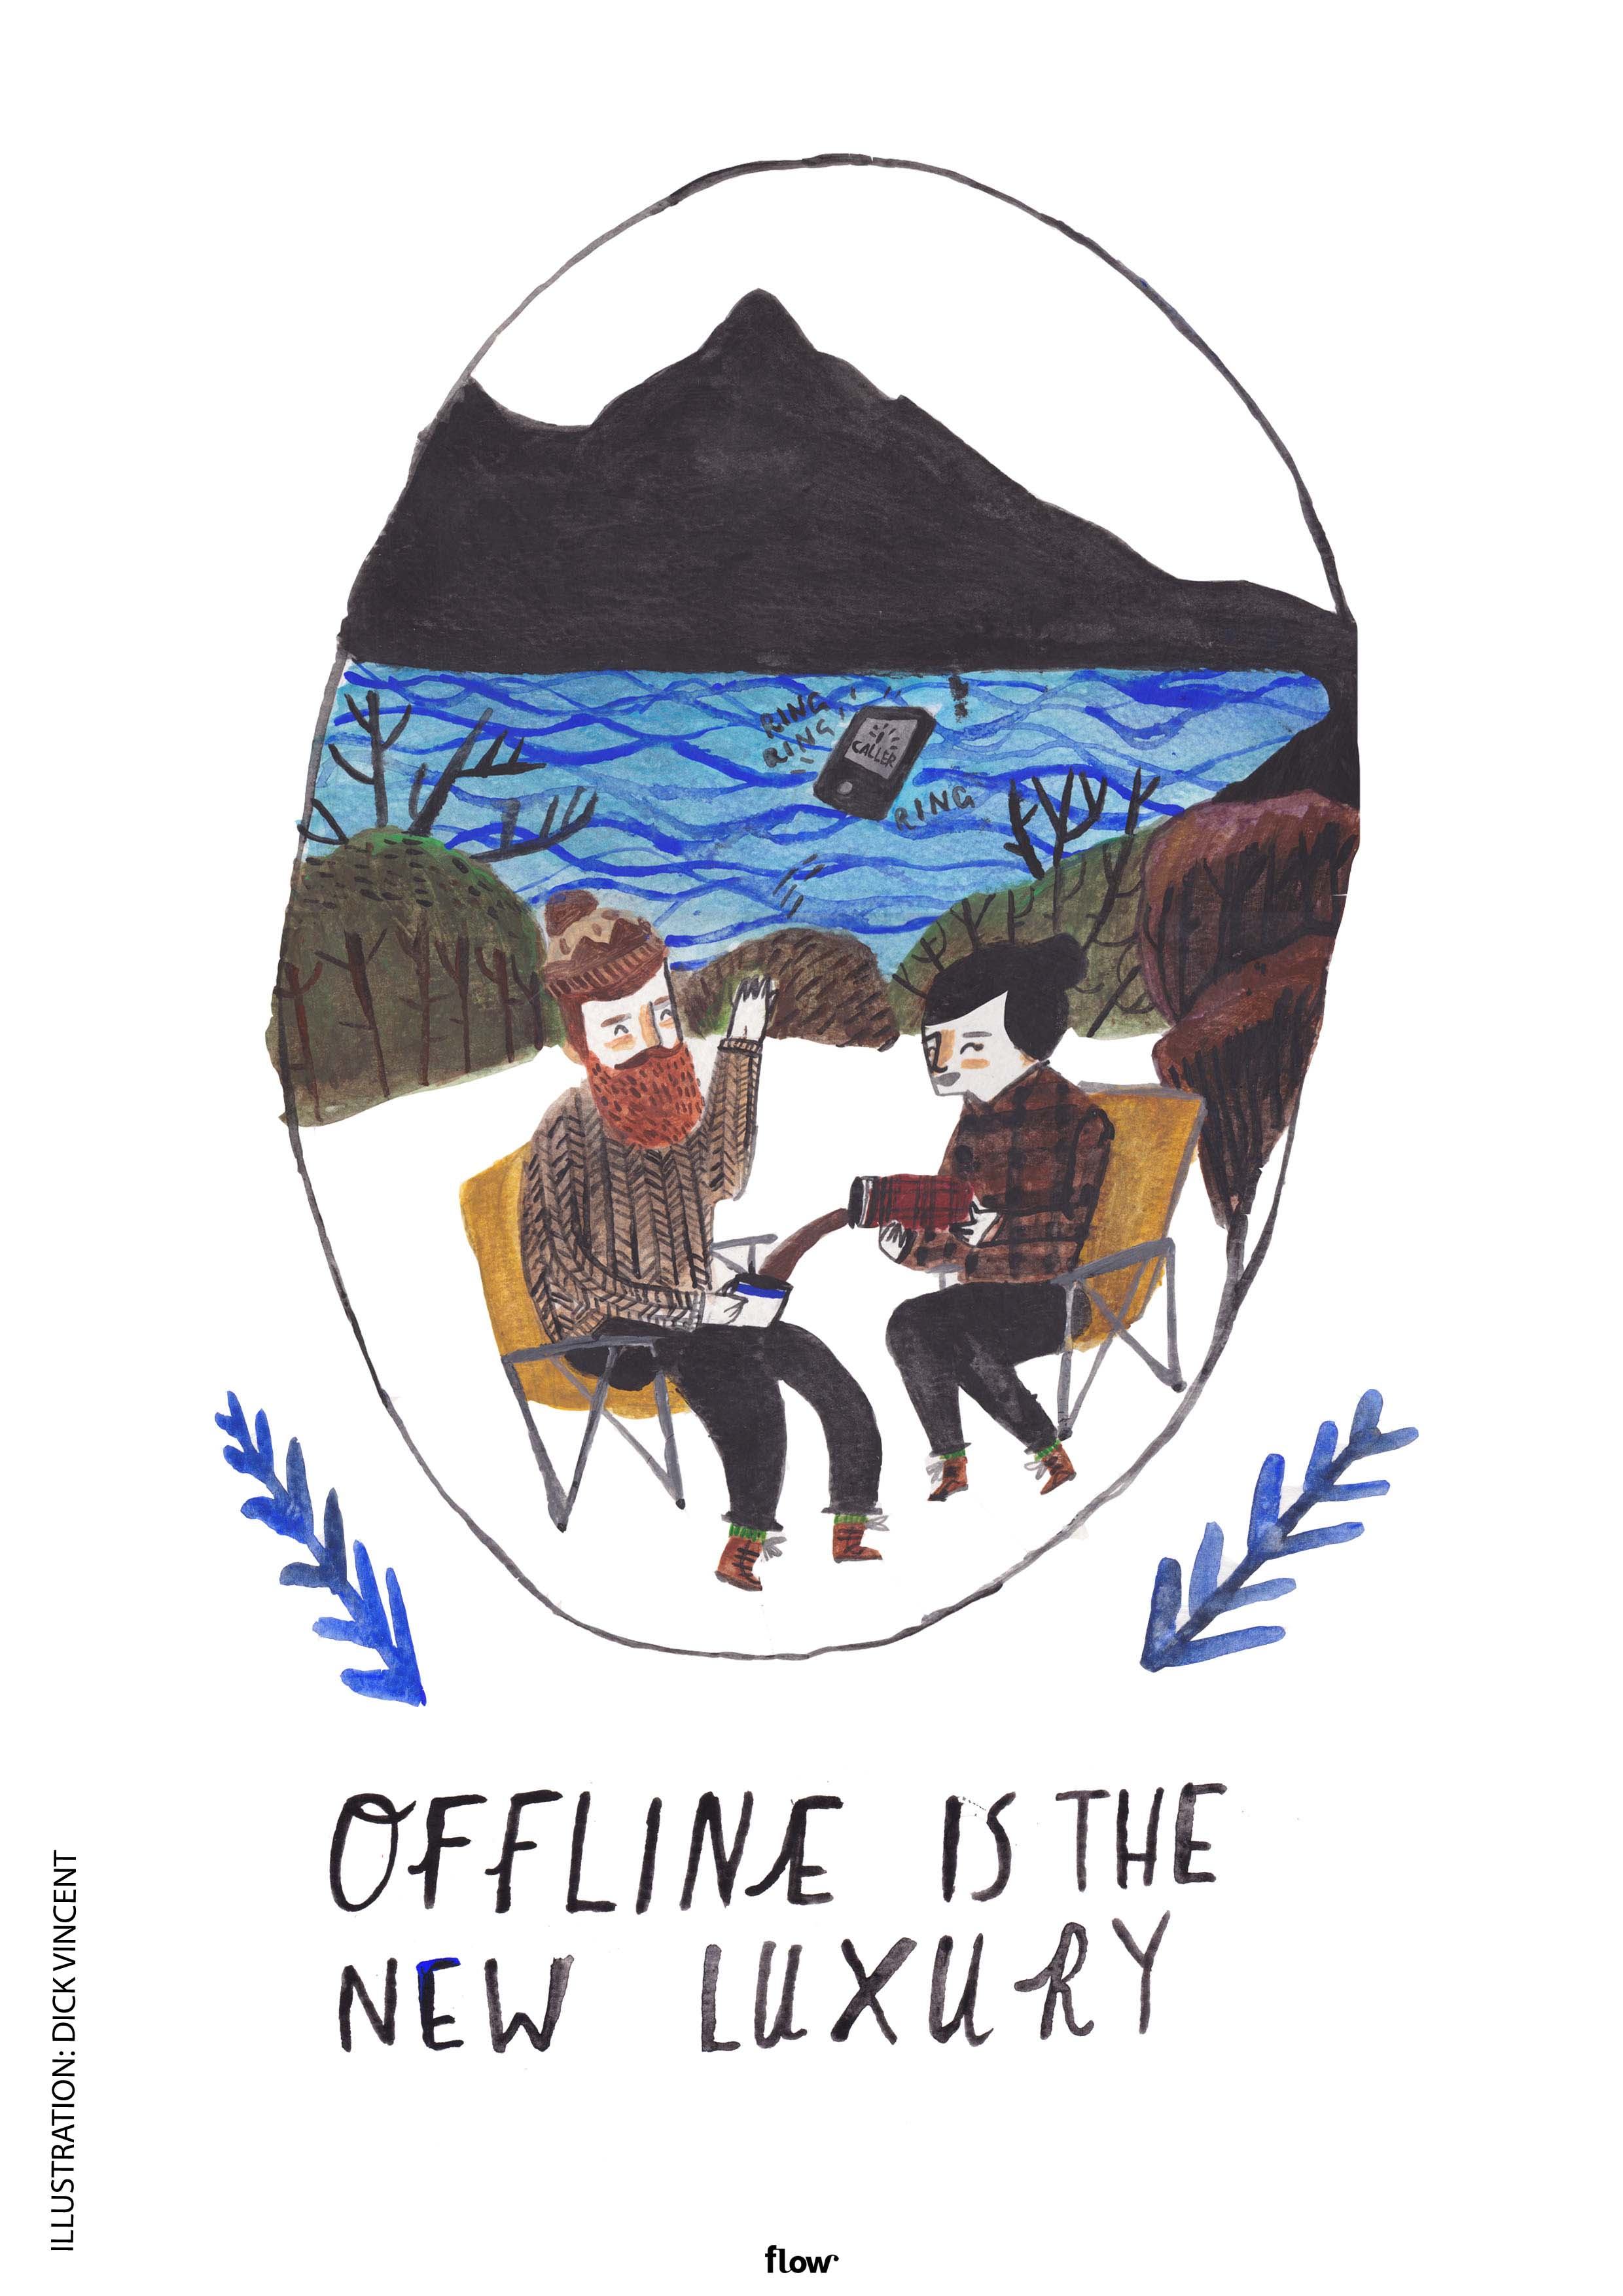 offlineisthenewluxury_flow-logo_dick-vincent-jpg